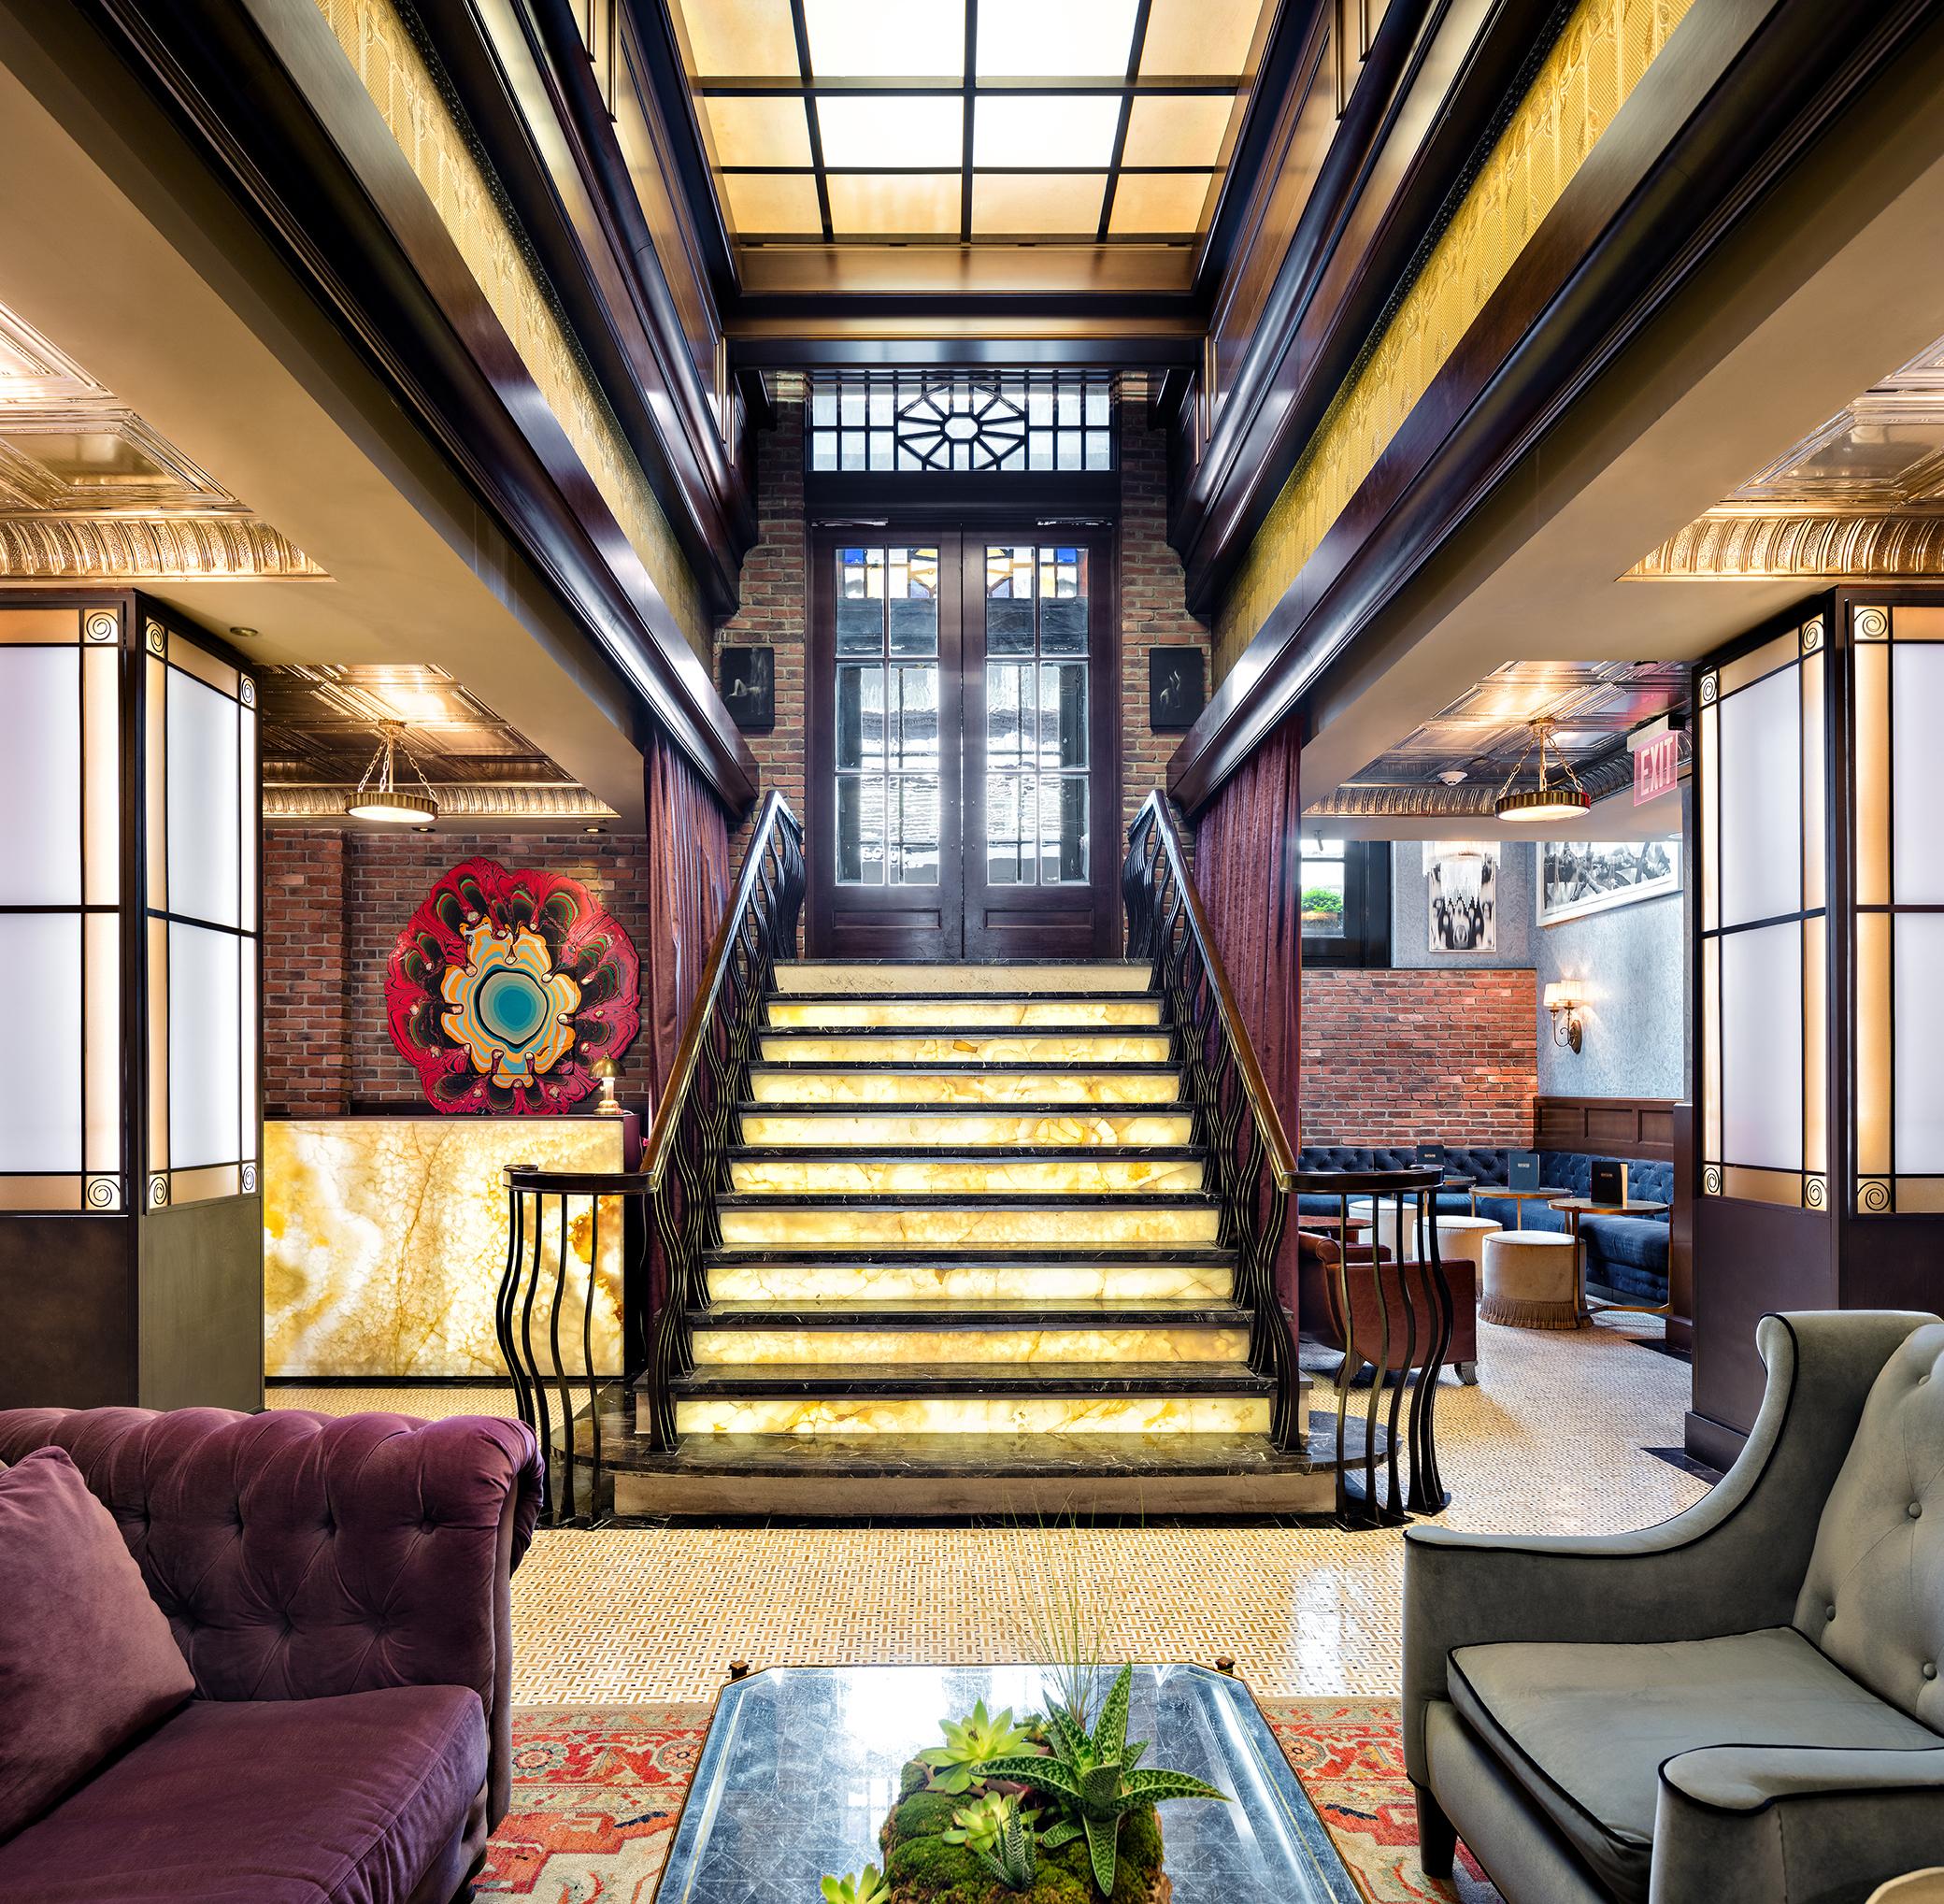 Walker Hotel Greenwich Village 52 West 13th Street New York Ny Hotels Motels Mapquest